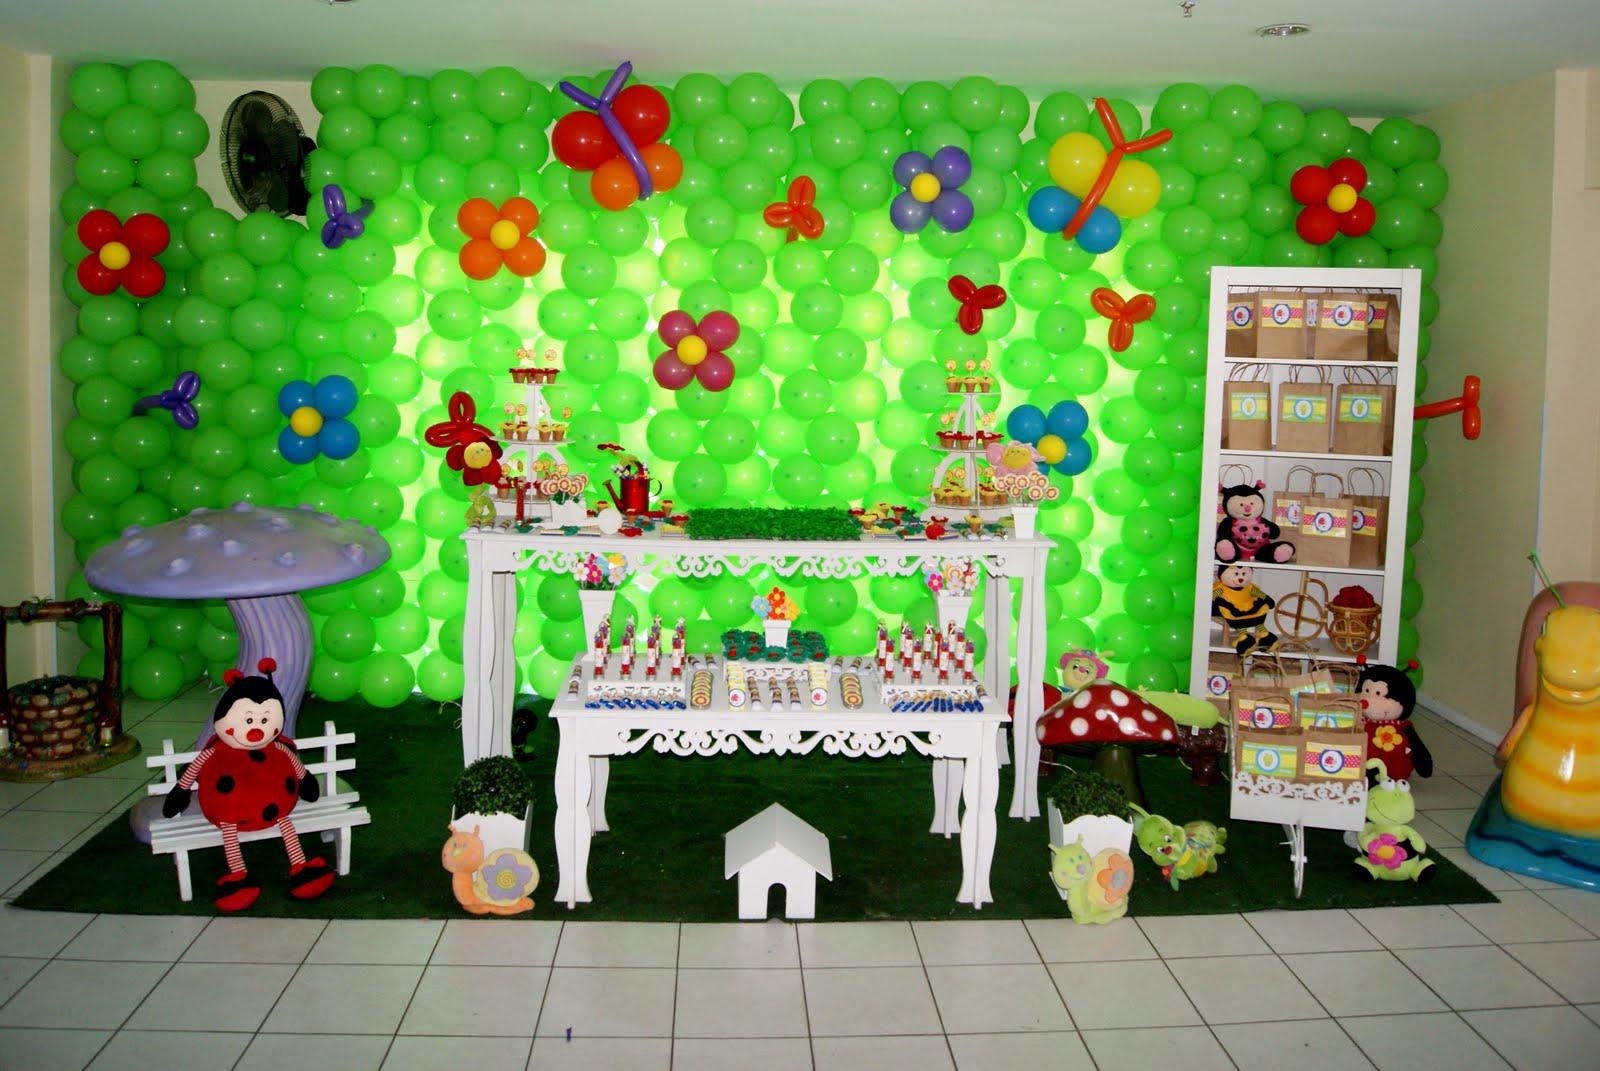 festa jardim dos ursos:Arte de Festejar: Festa do jardim clean